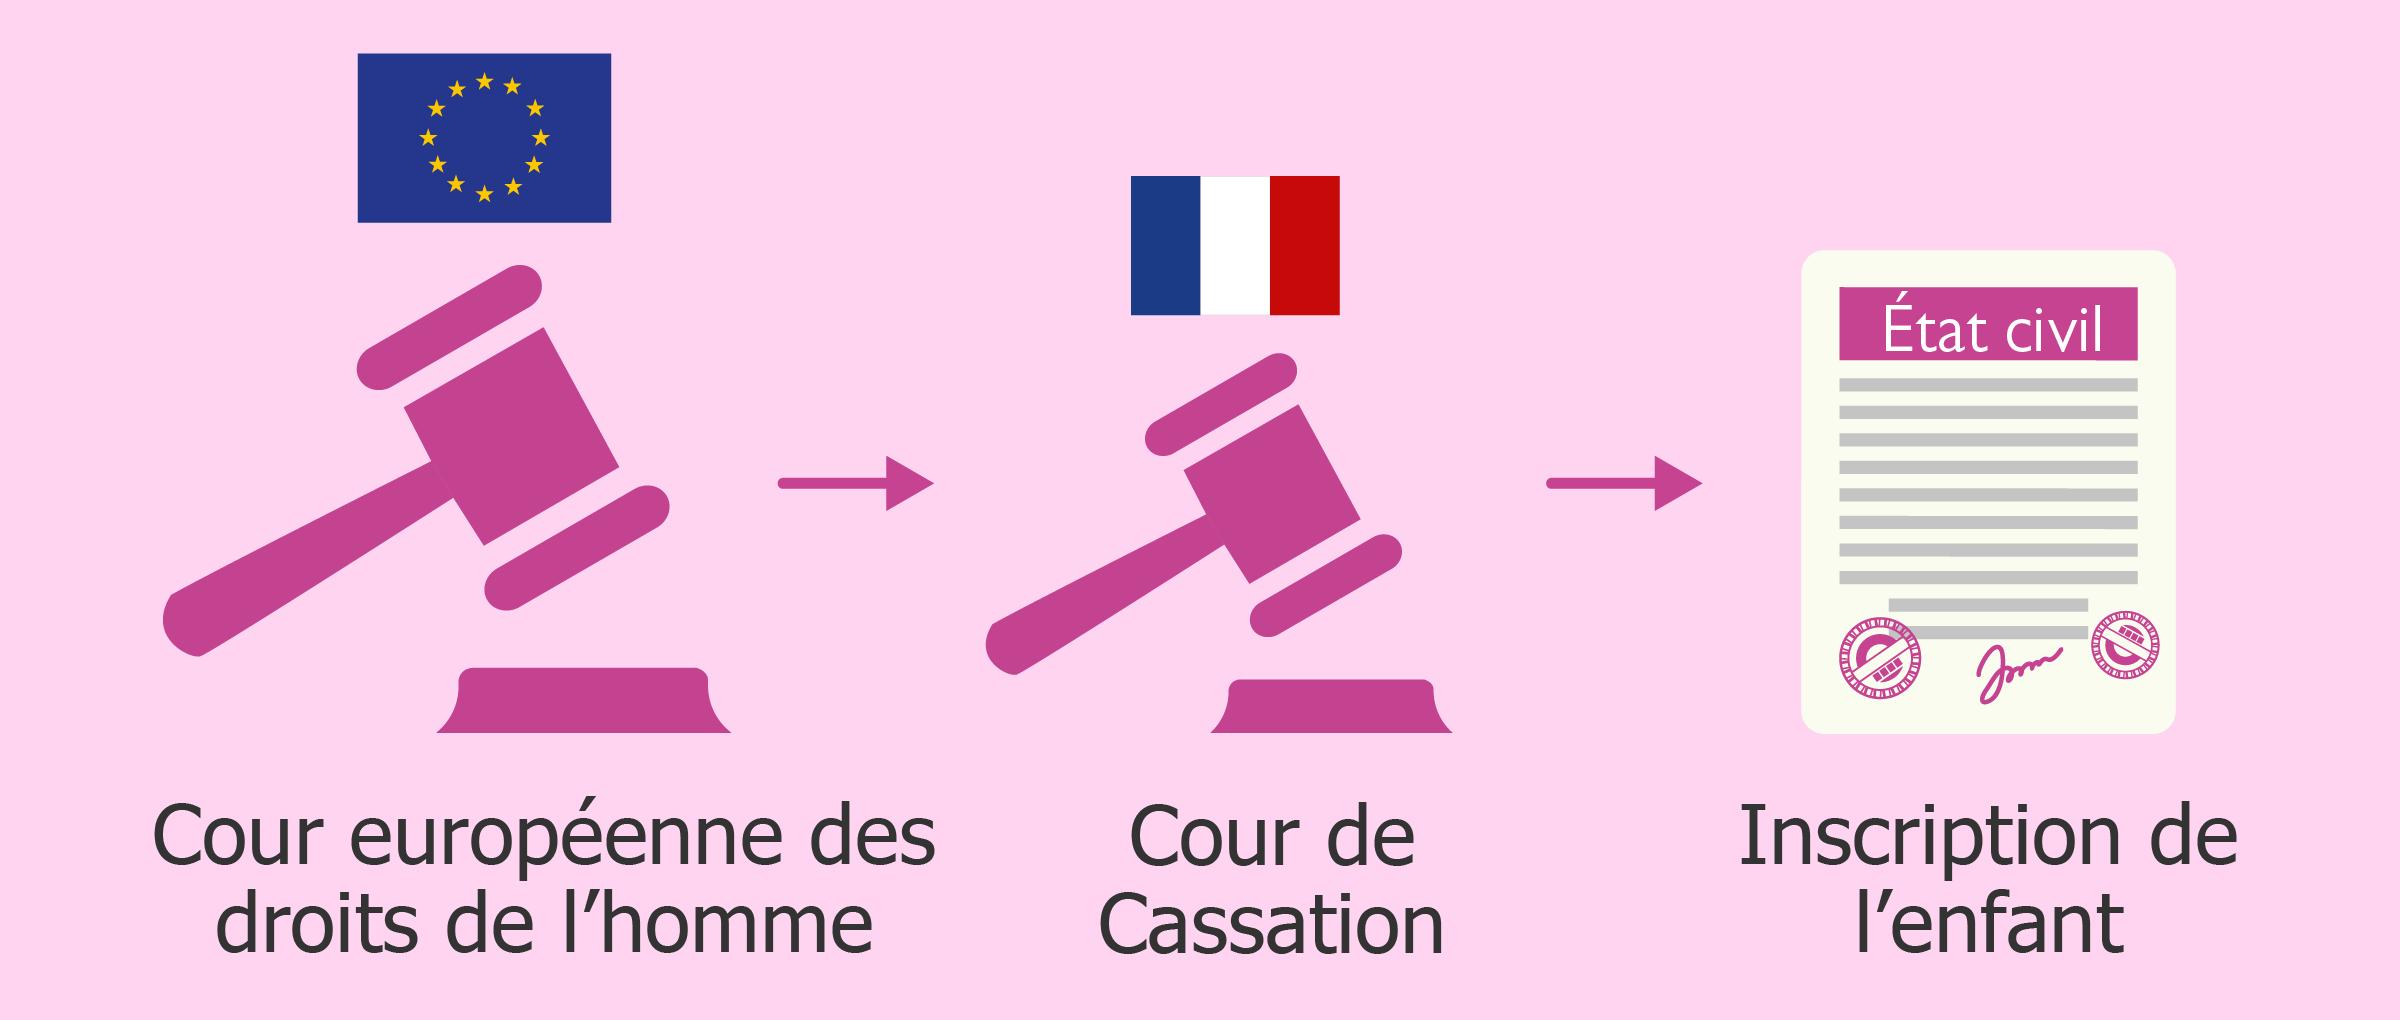 La France condamnée par la CEDH modifie sa jurisprudence sur la GPA